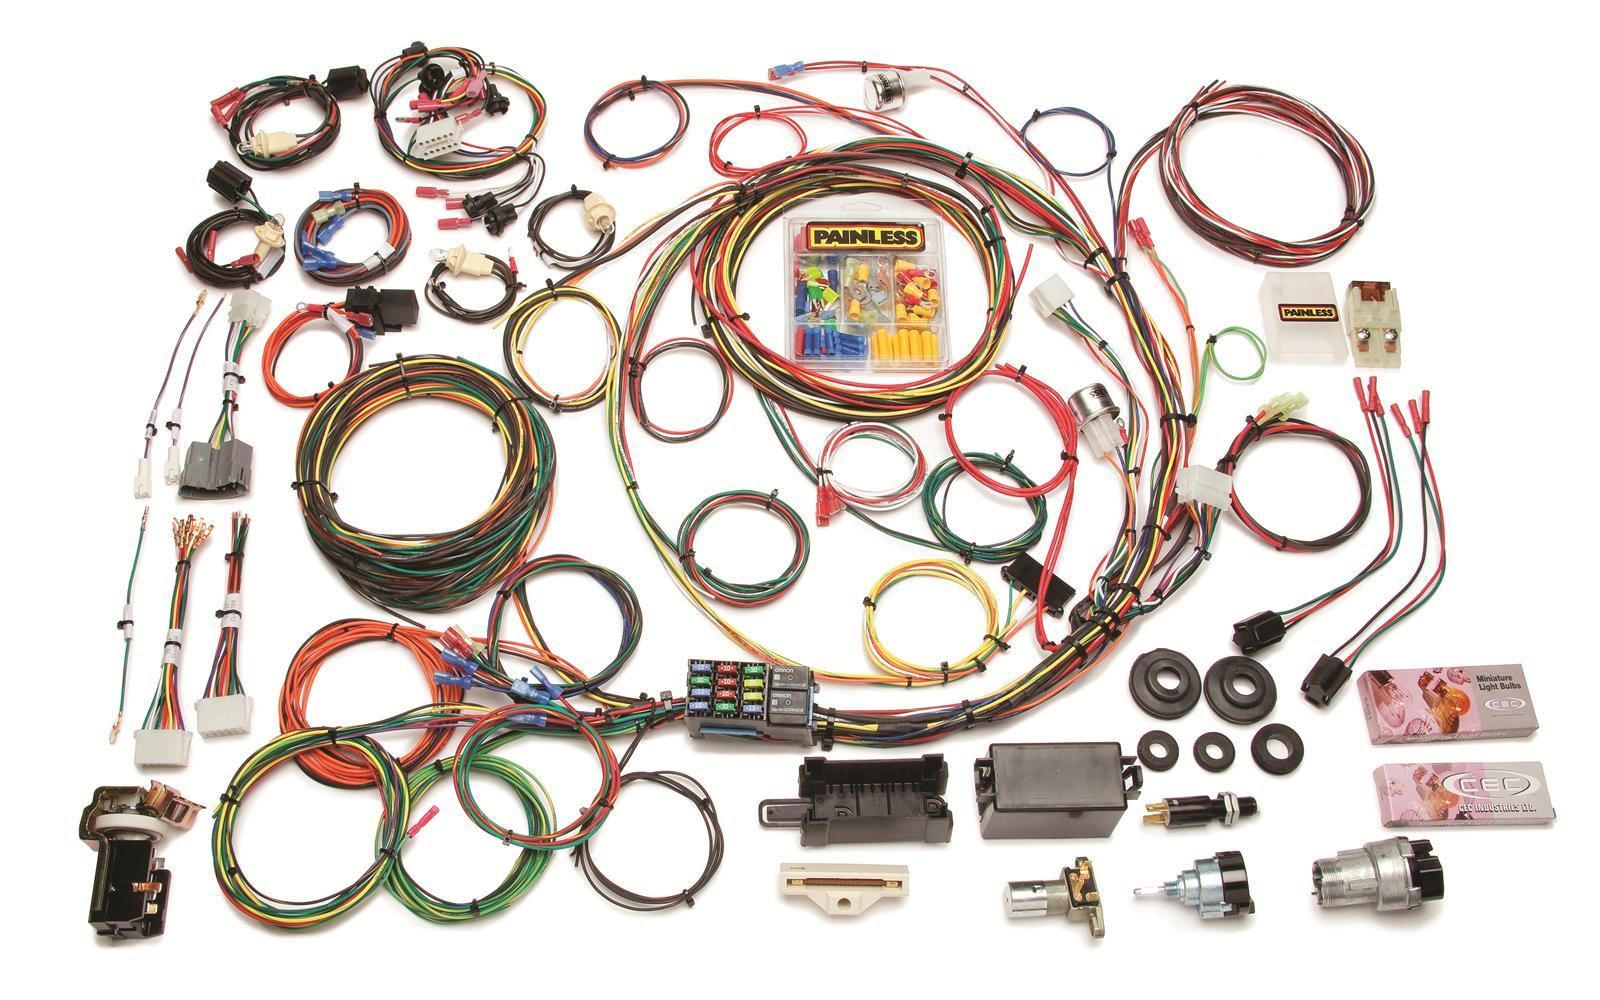 Universal Wiring Harness Instructions : Painless performance universal truck harness ebay